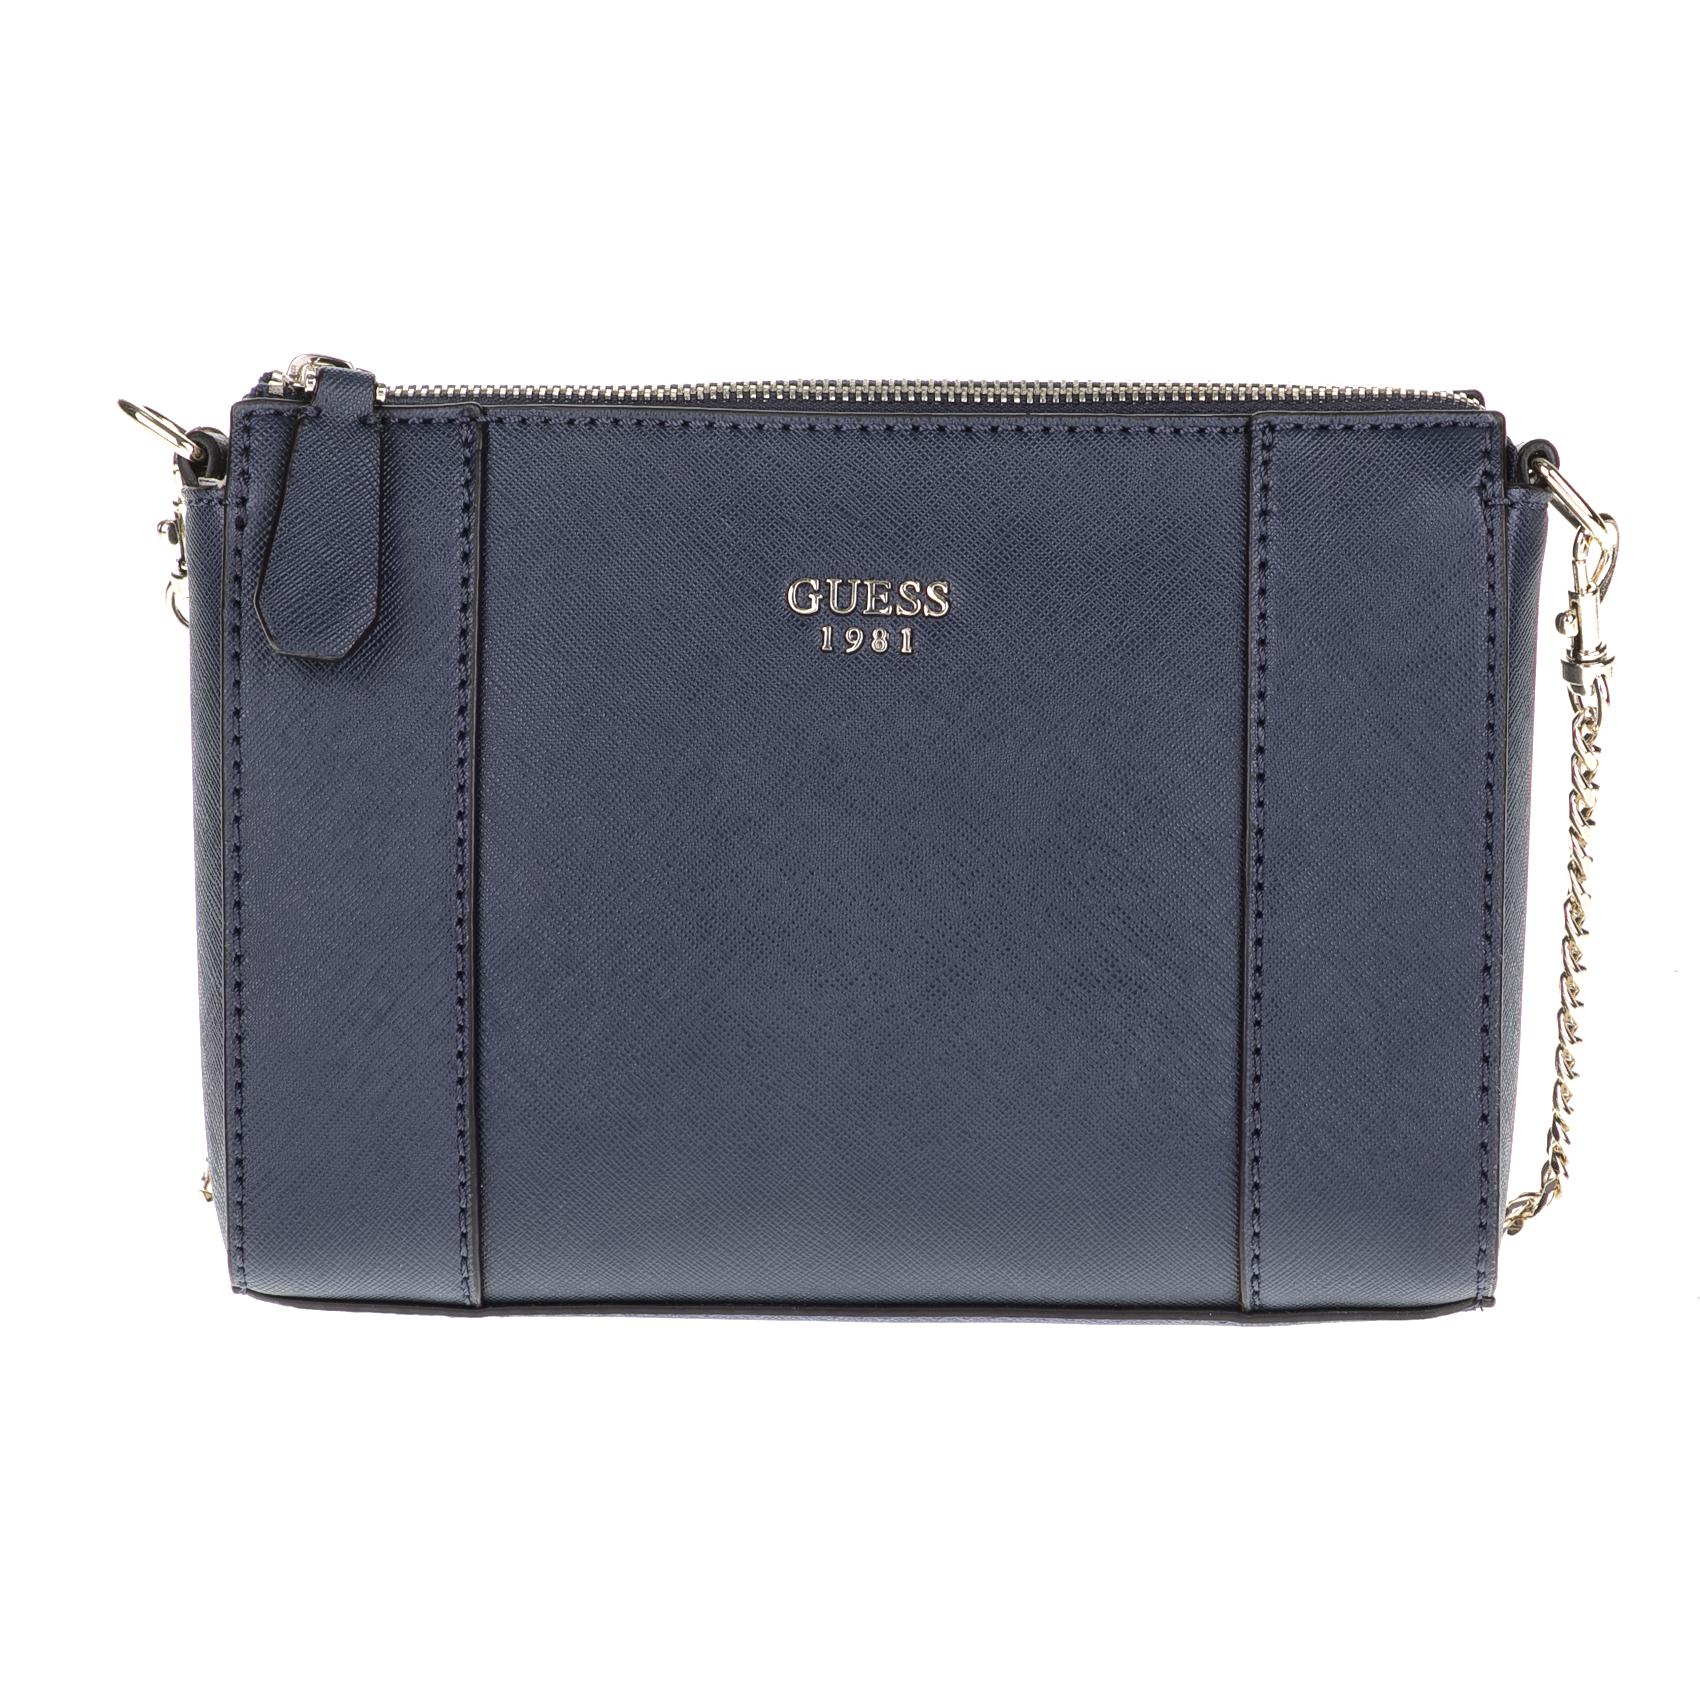 GUESS – Γυναικεία τσάντα ώμου GUESS KAMRYN μπλε 1549214.0-0016